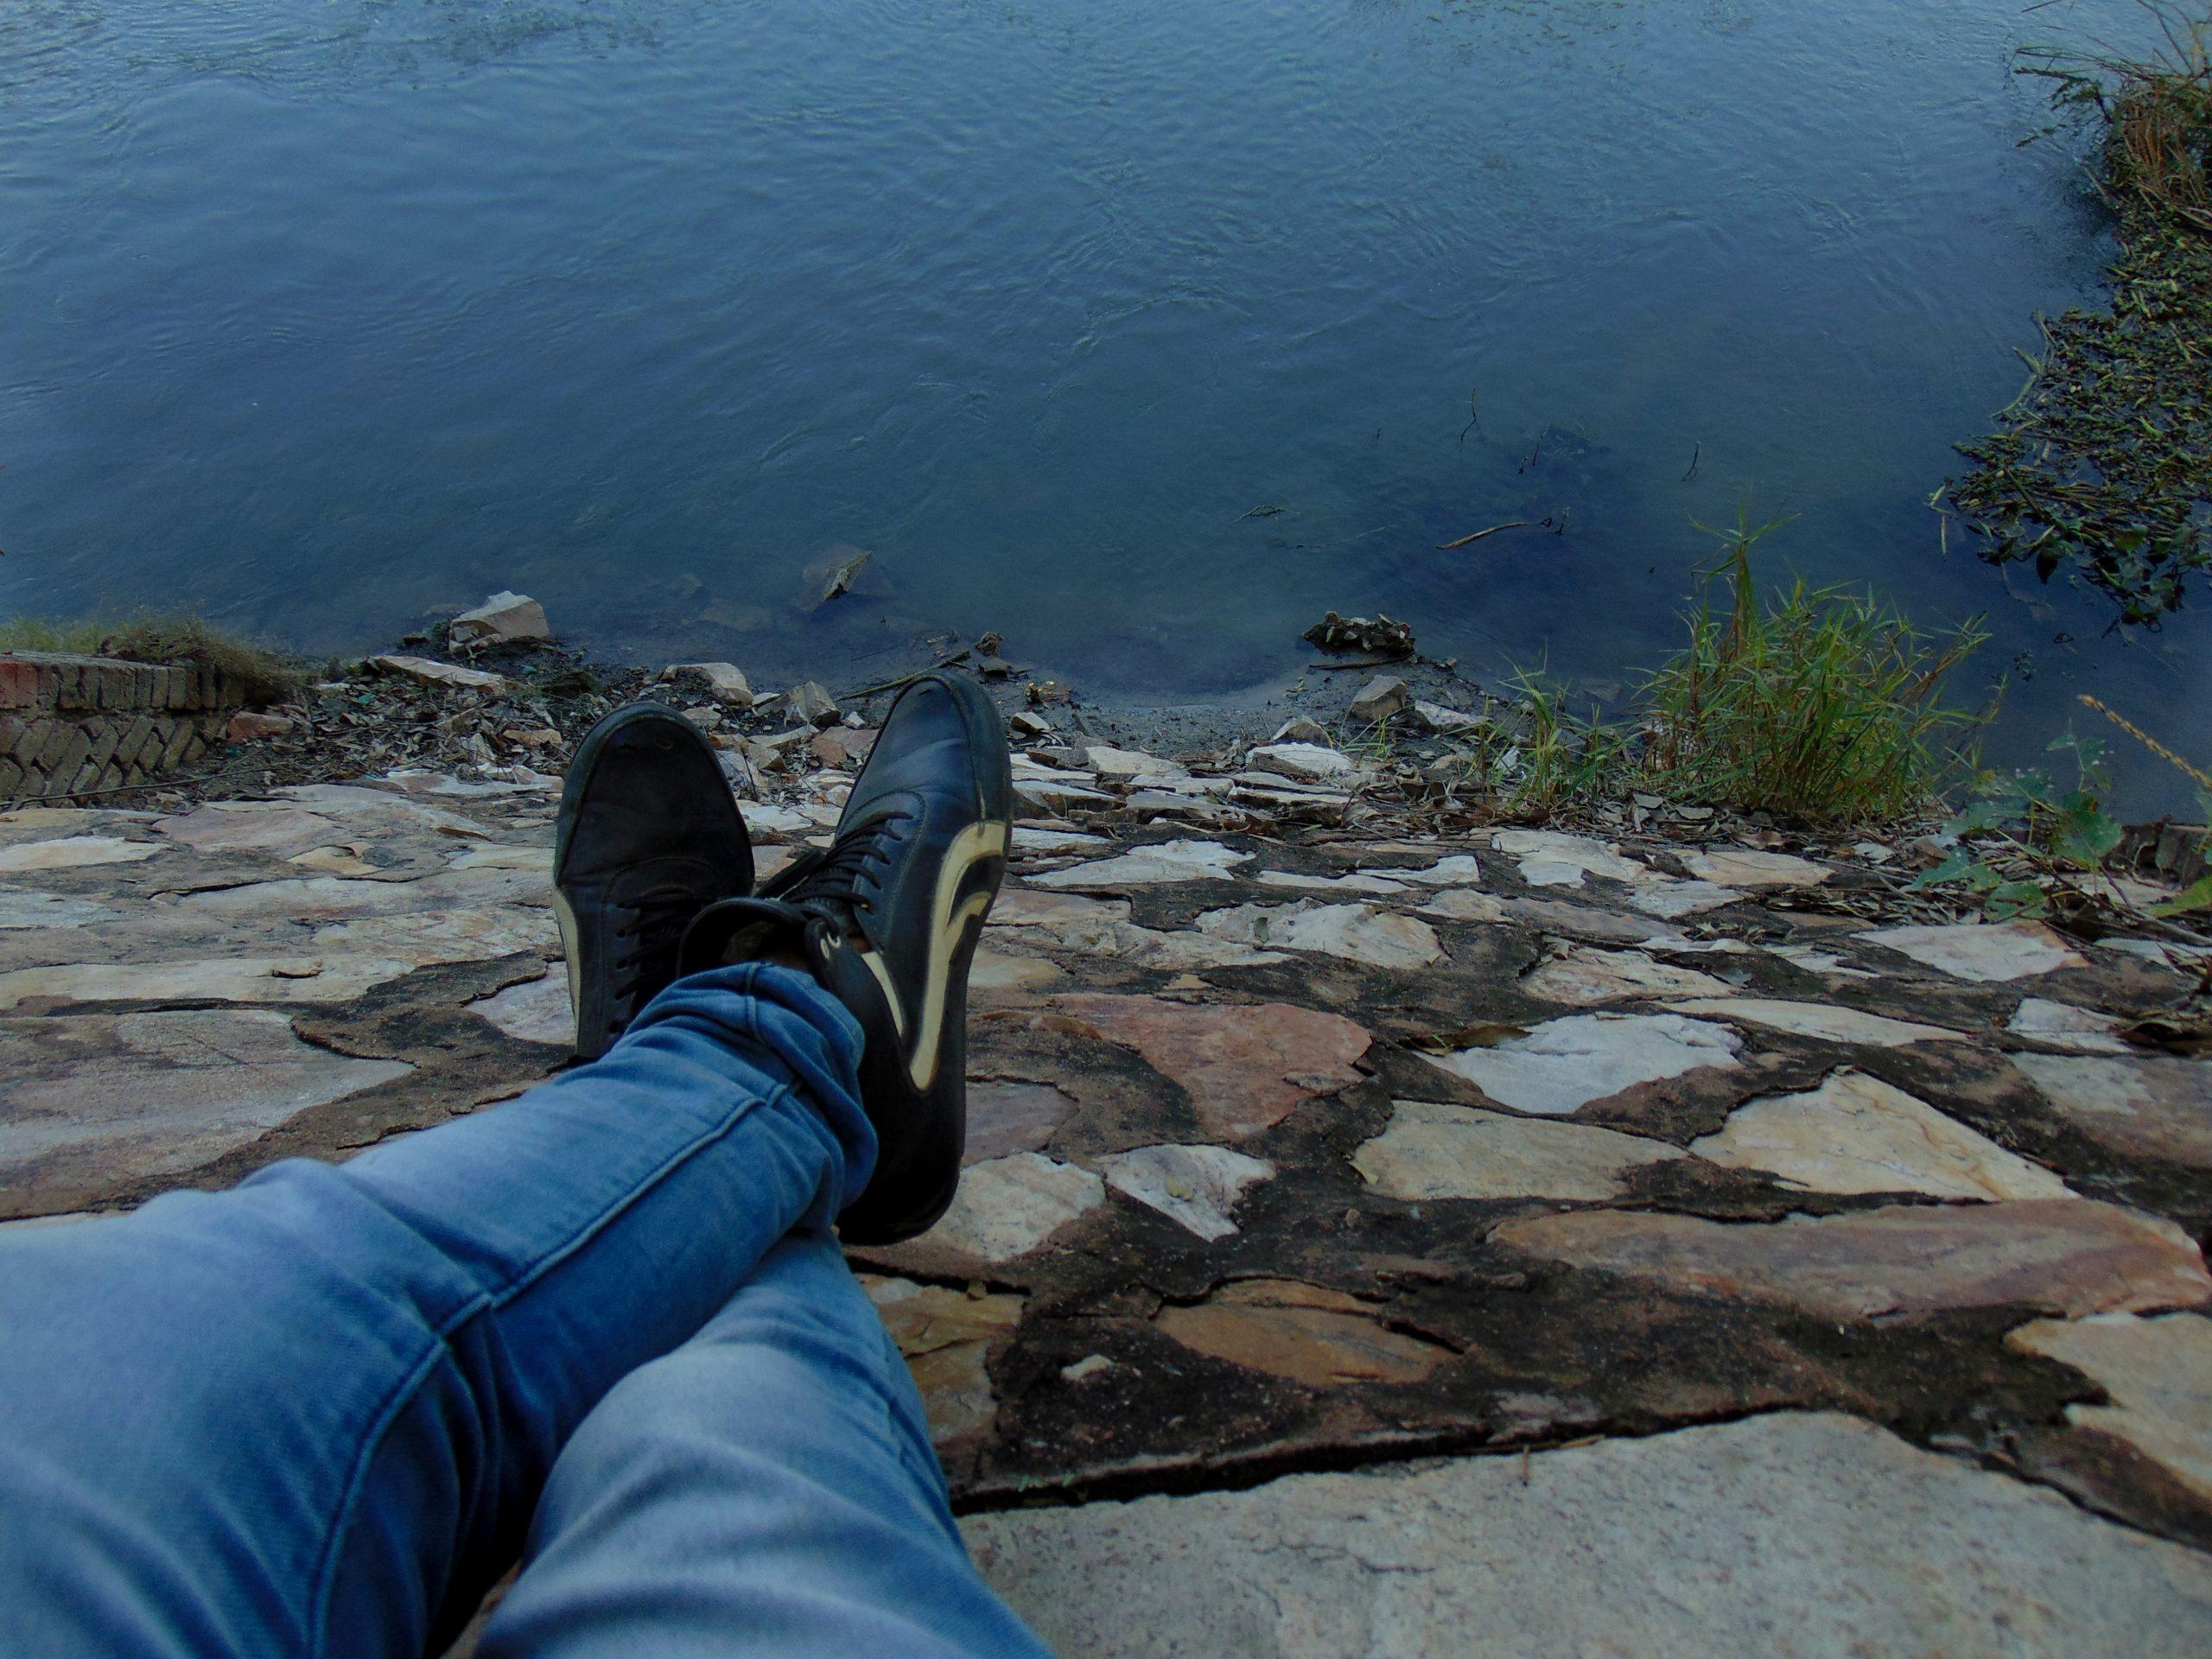 Resting human legs near a lake